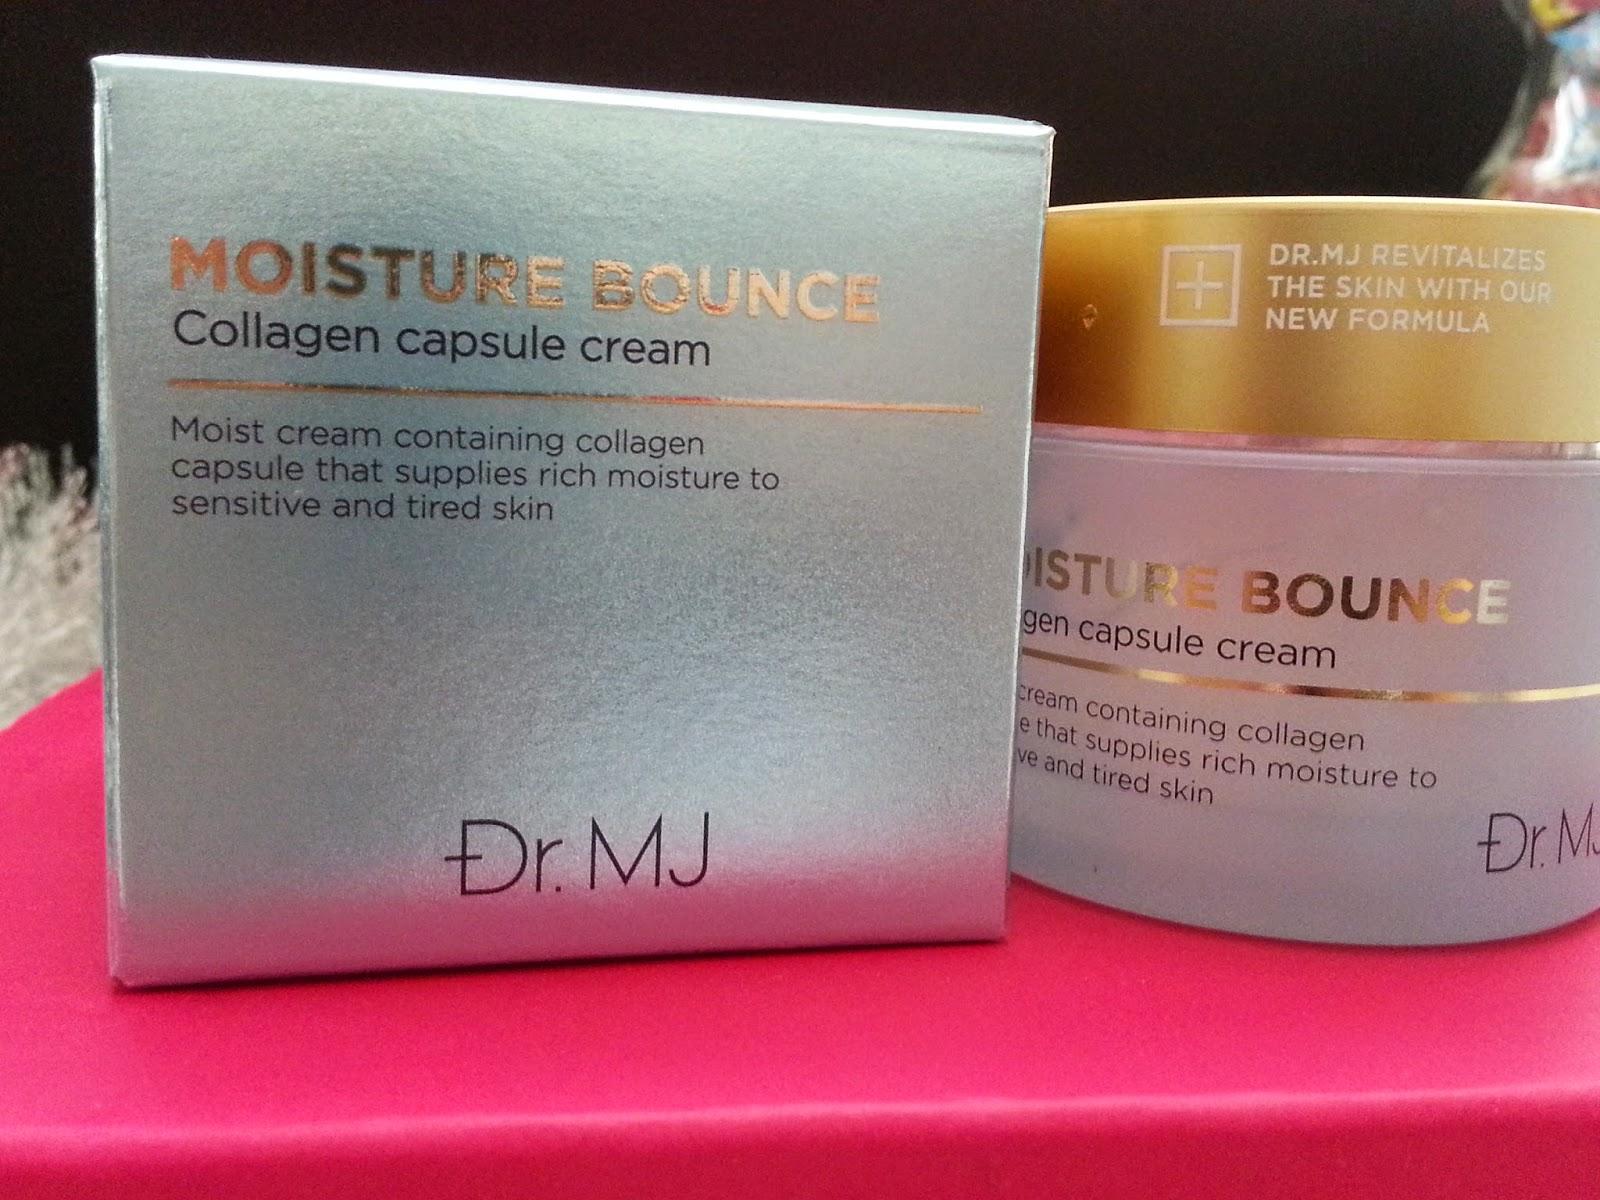 Dr. MJ Moisture Bounce Collagen Capsule Cream